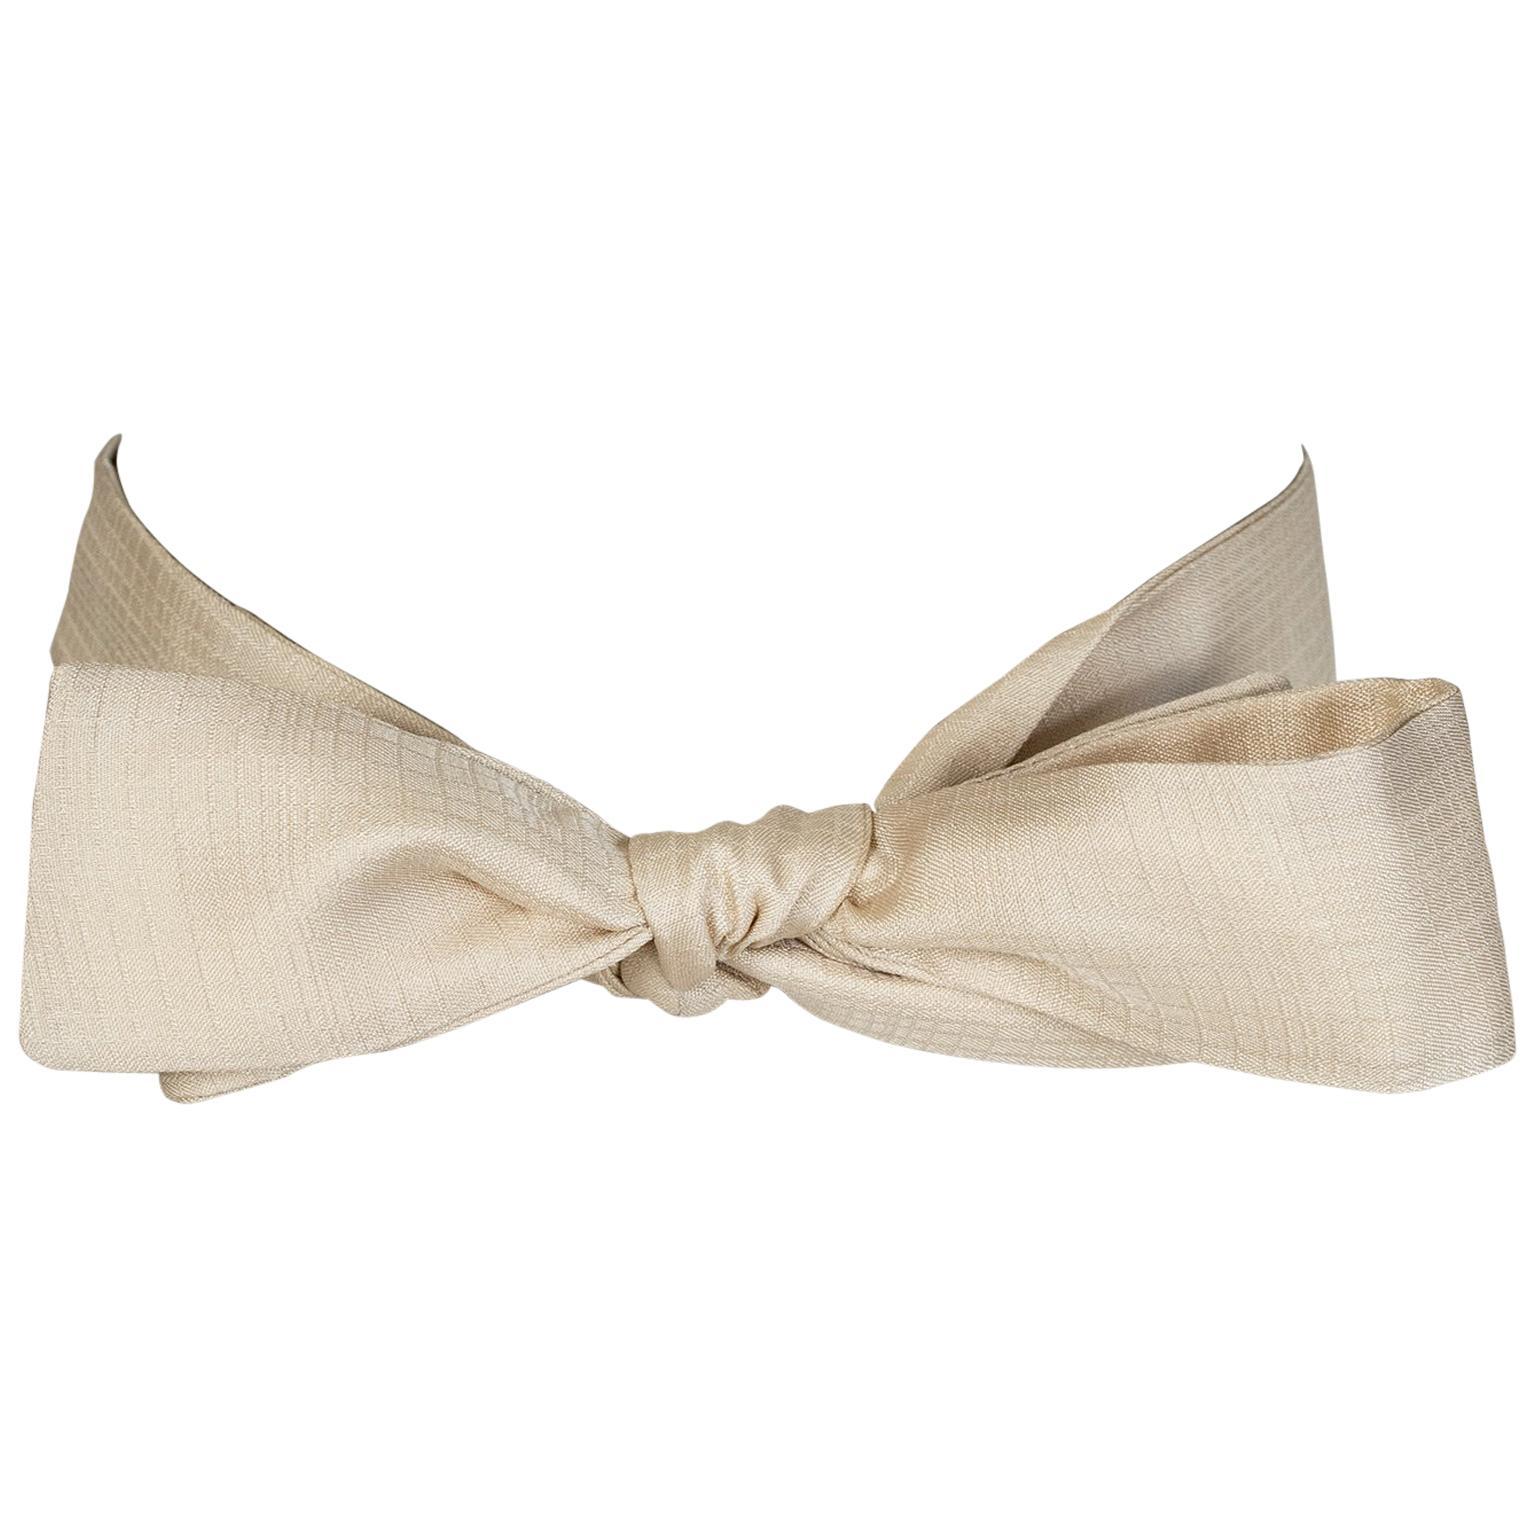 Men's Raw Ivory Tonal Silk Slim Bow Tie – Chicago, 1970s